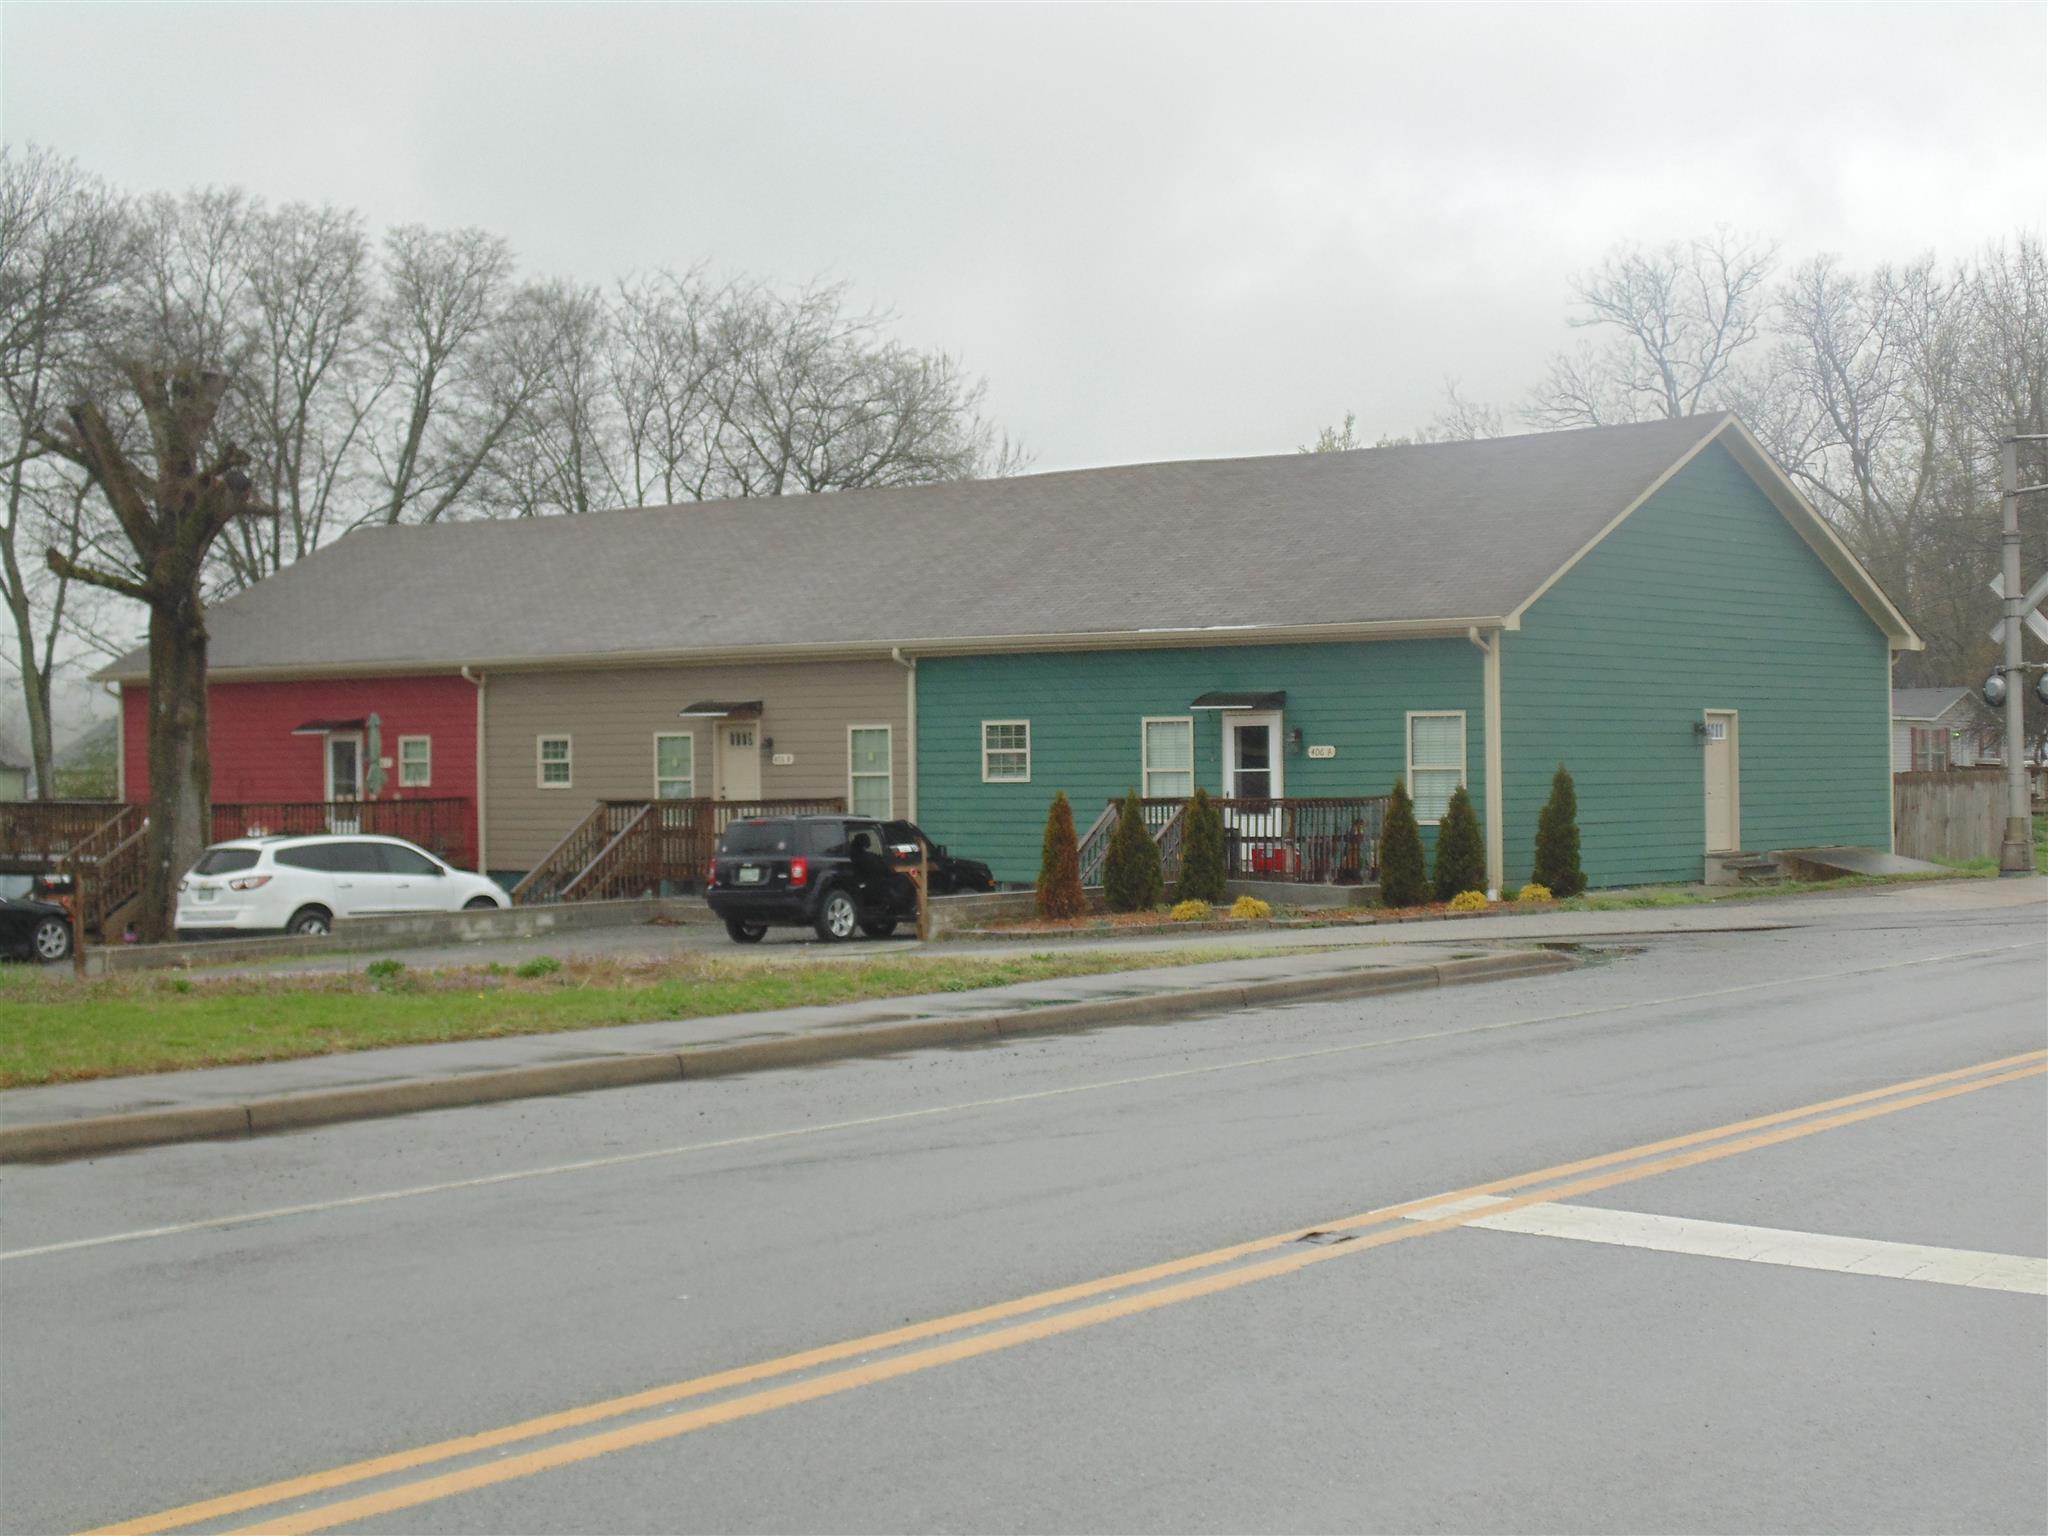 406 Blackman Blvd, E, Wartrace, TN 37183 - Wartrace, TN real estate listing